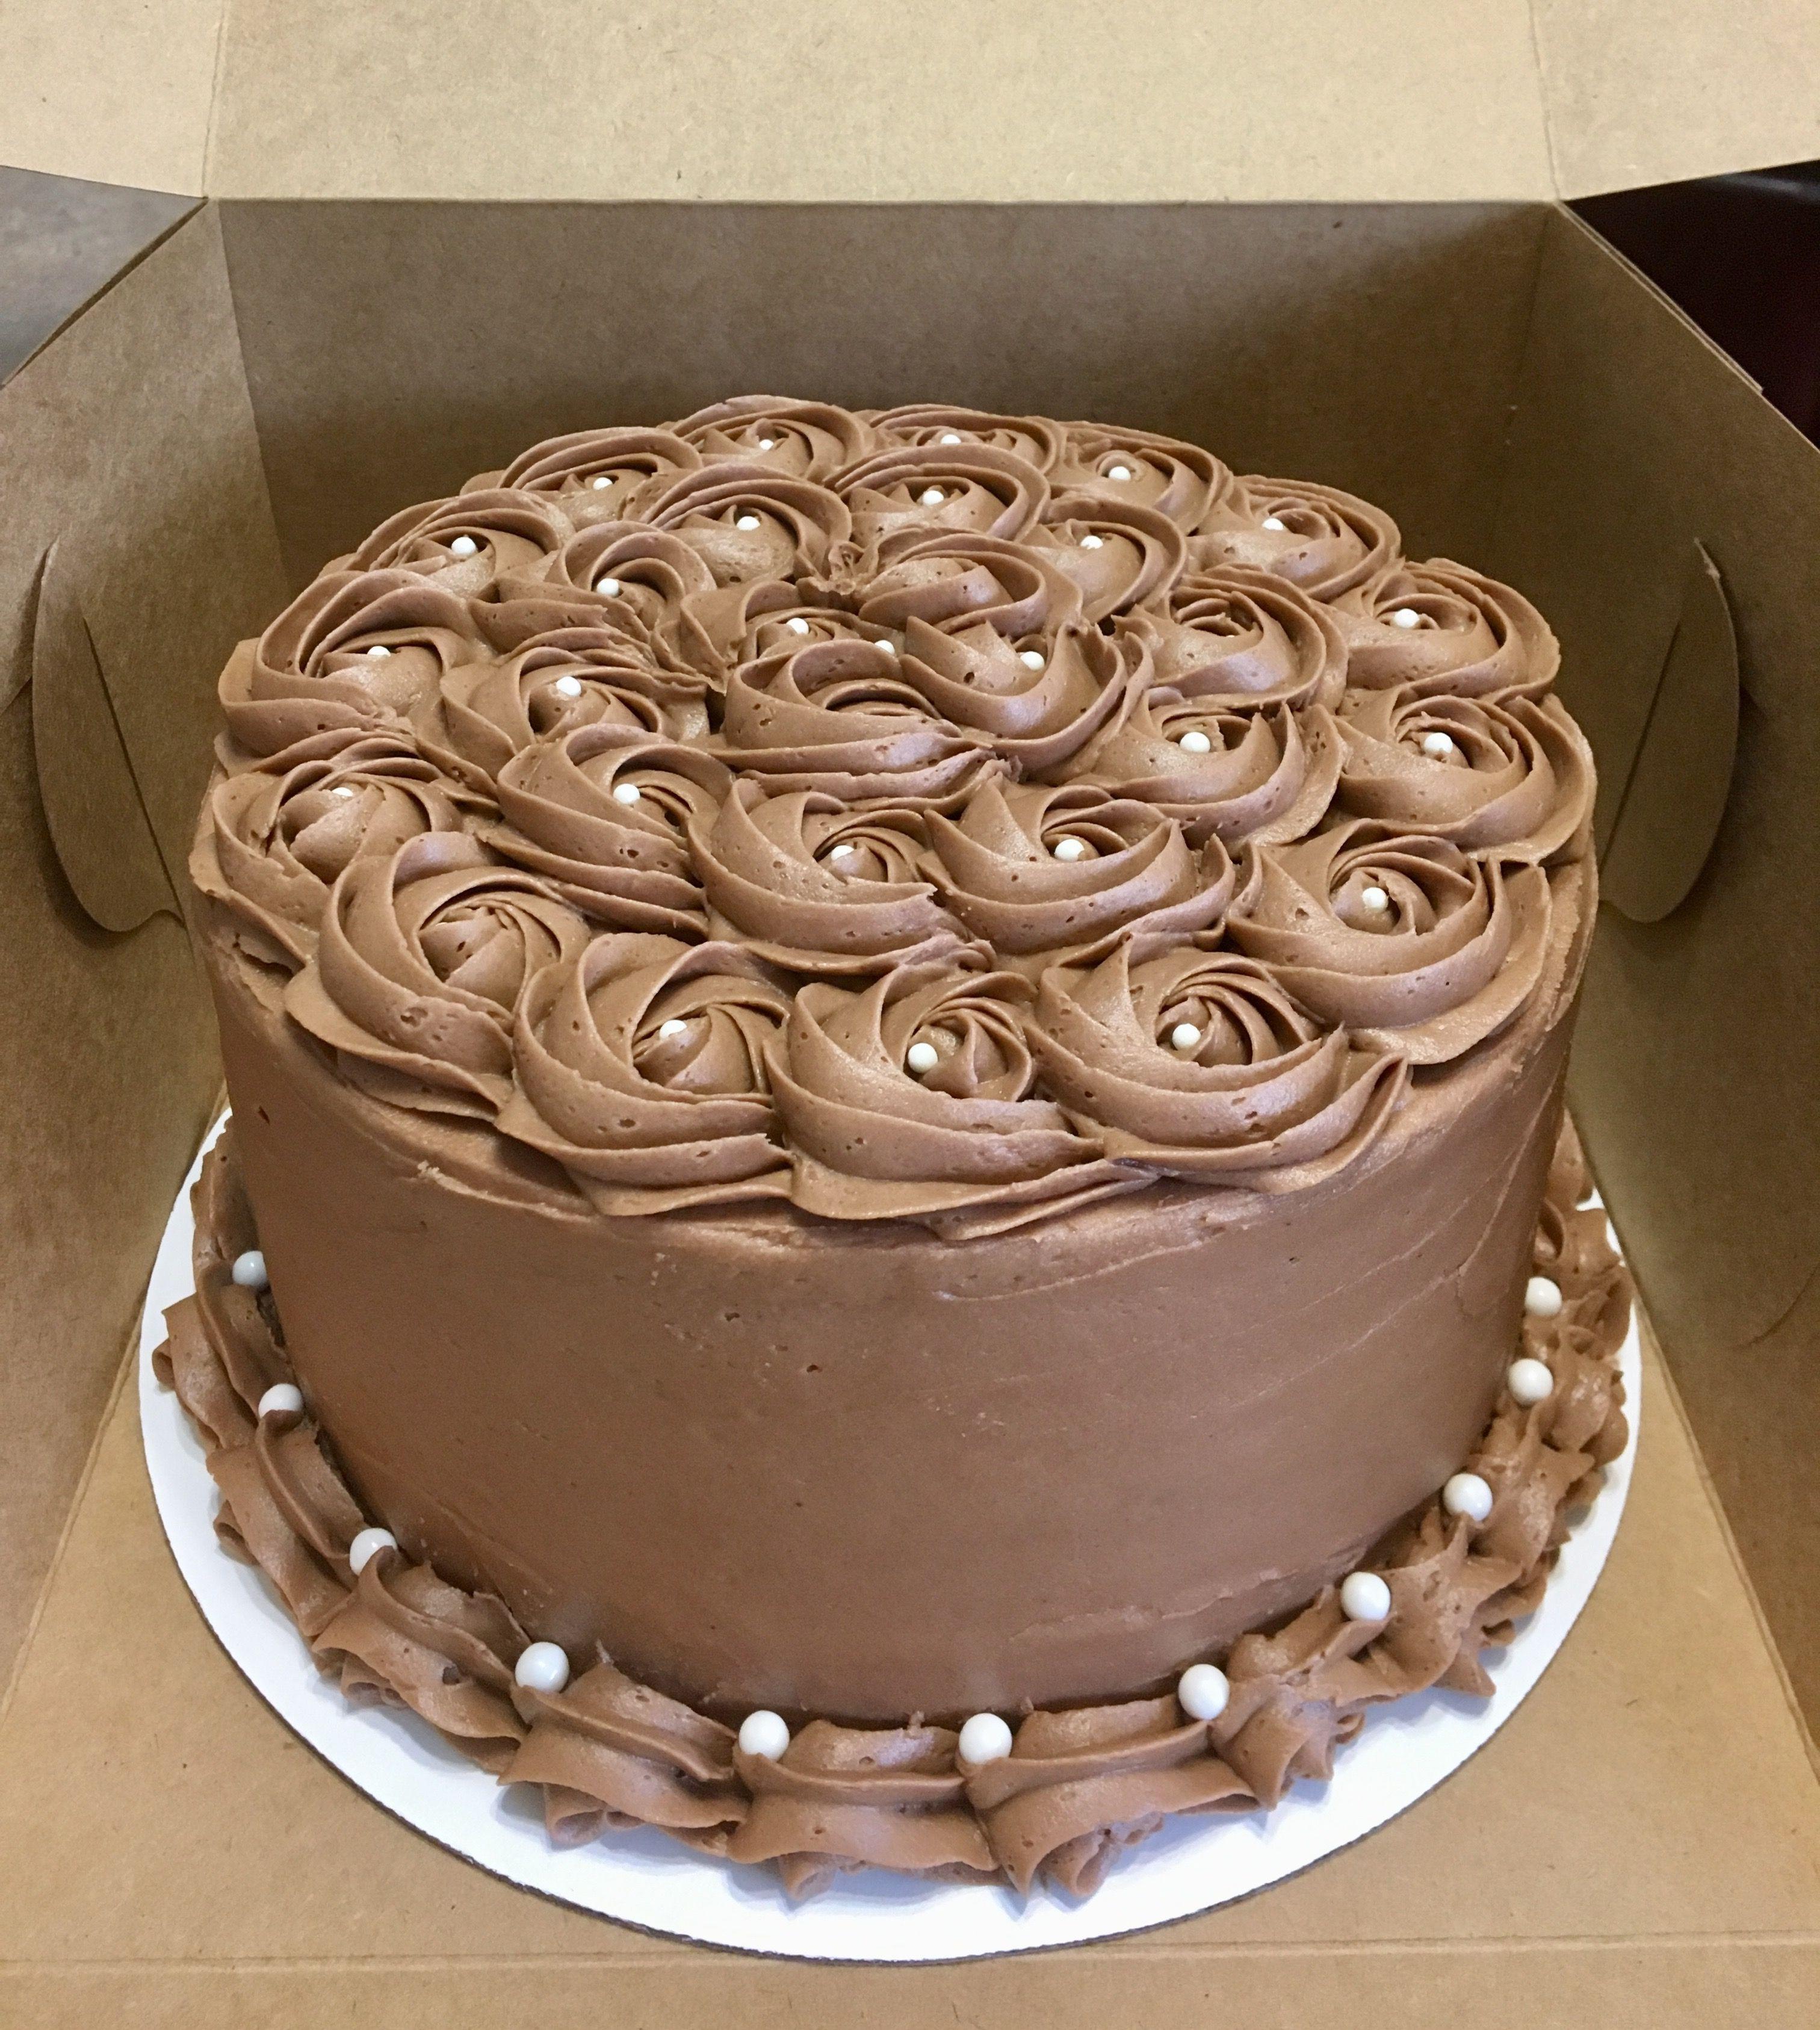 Chocolate Rosette Cake 3 Layer 8 Round Chocolate Cake With